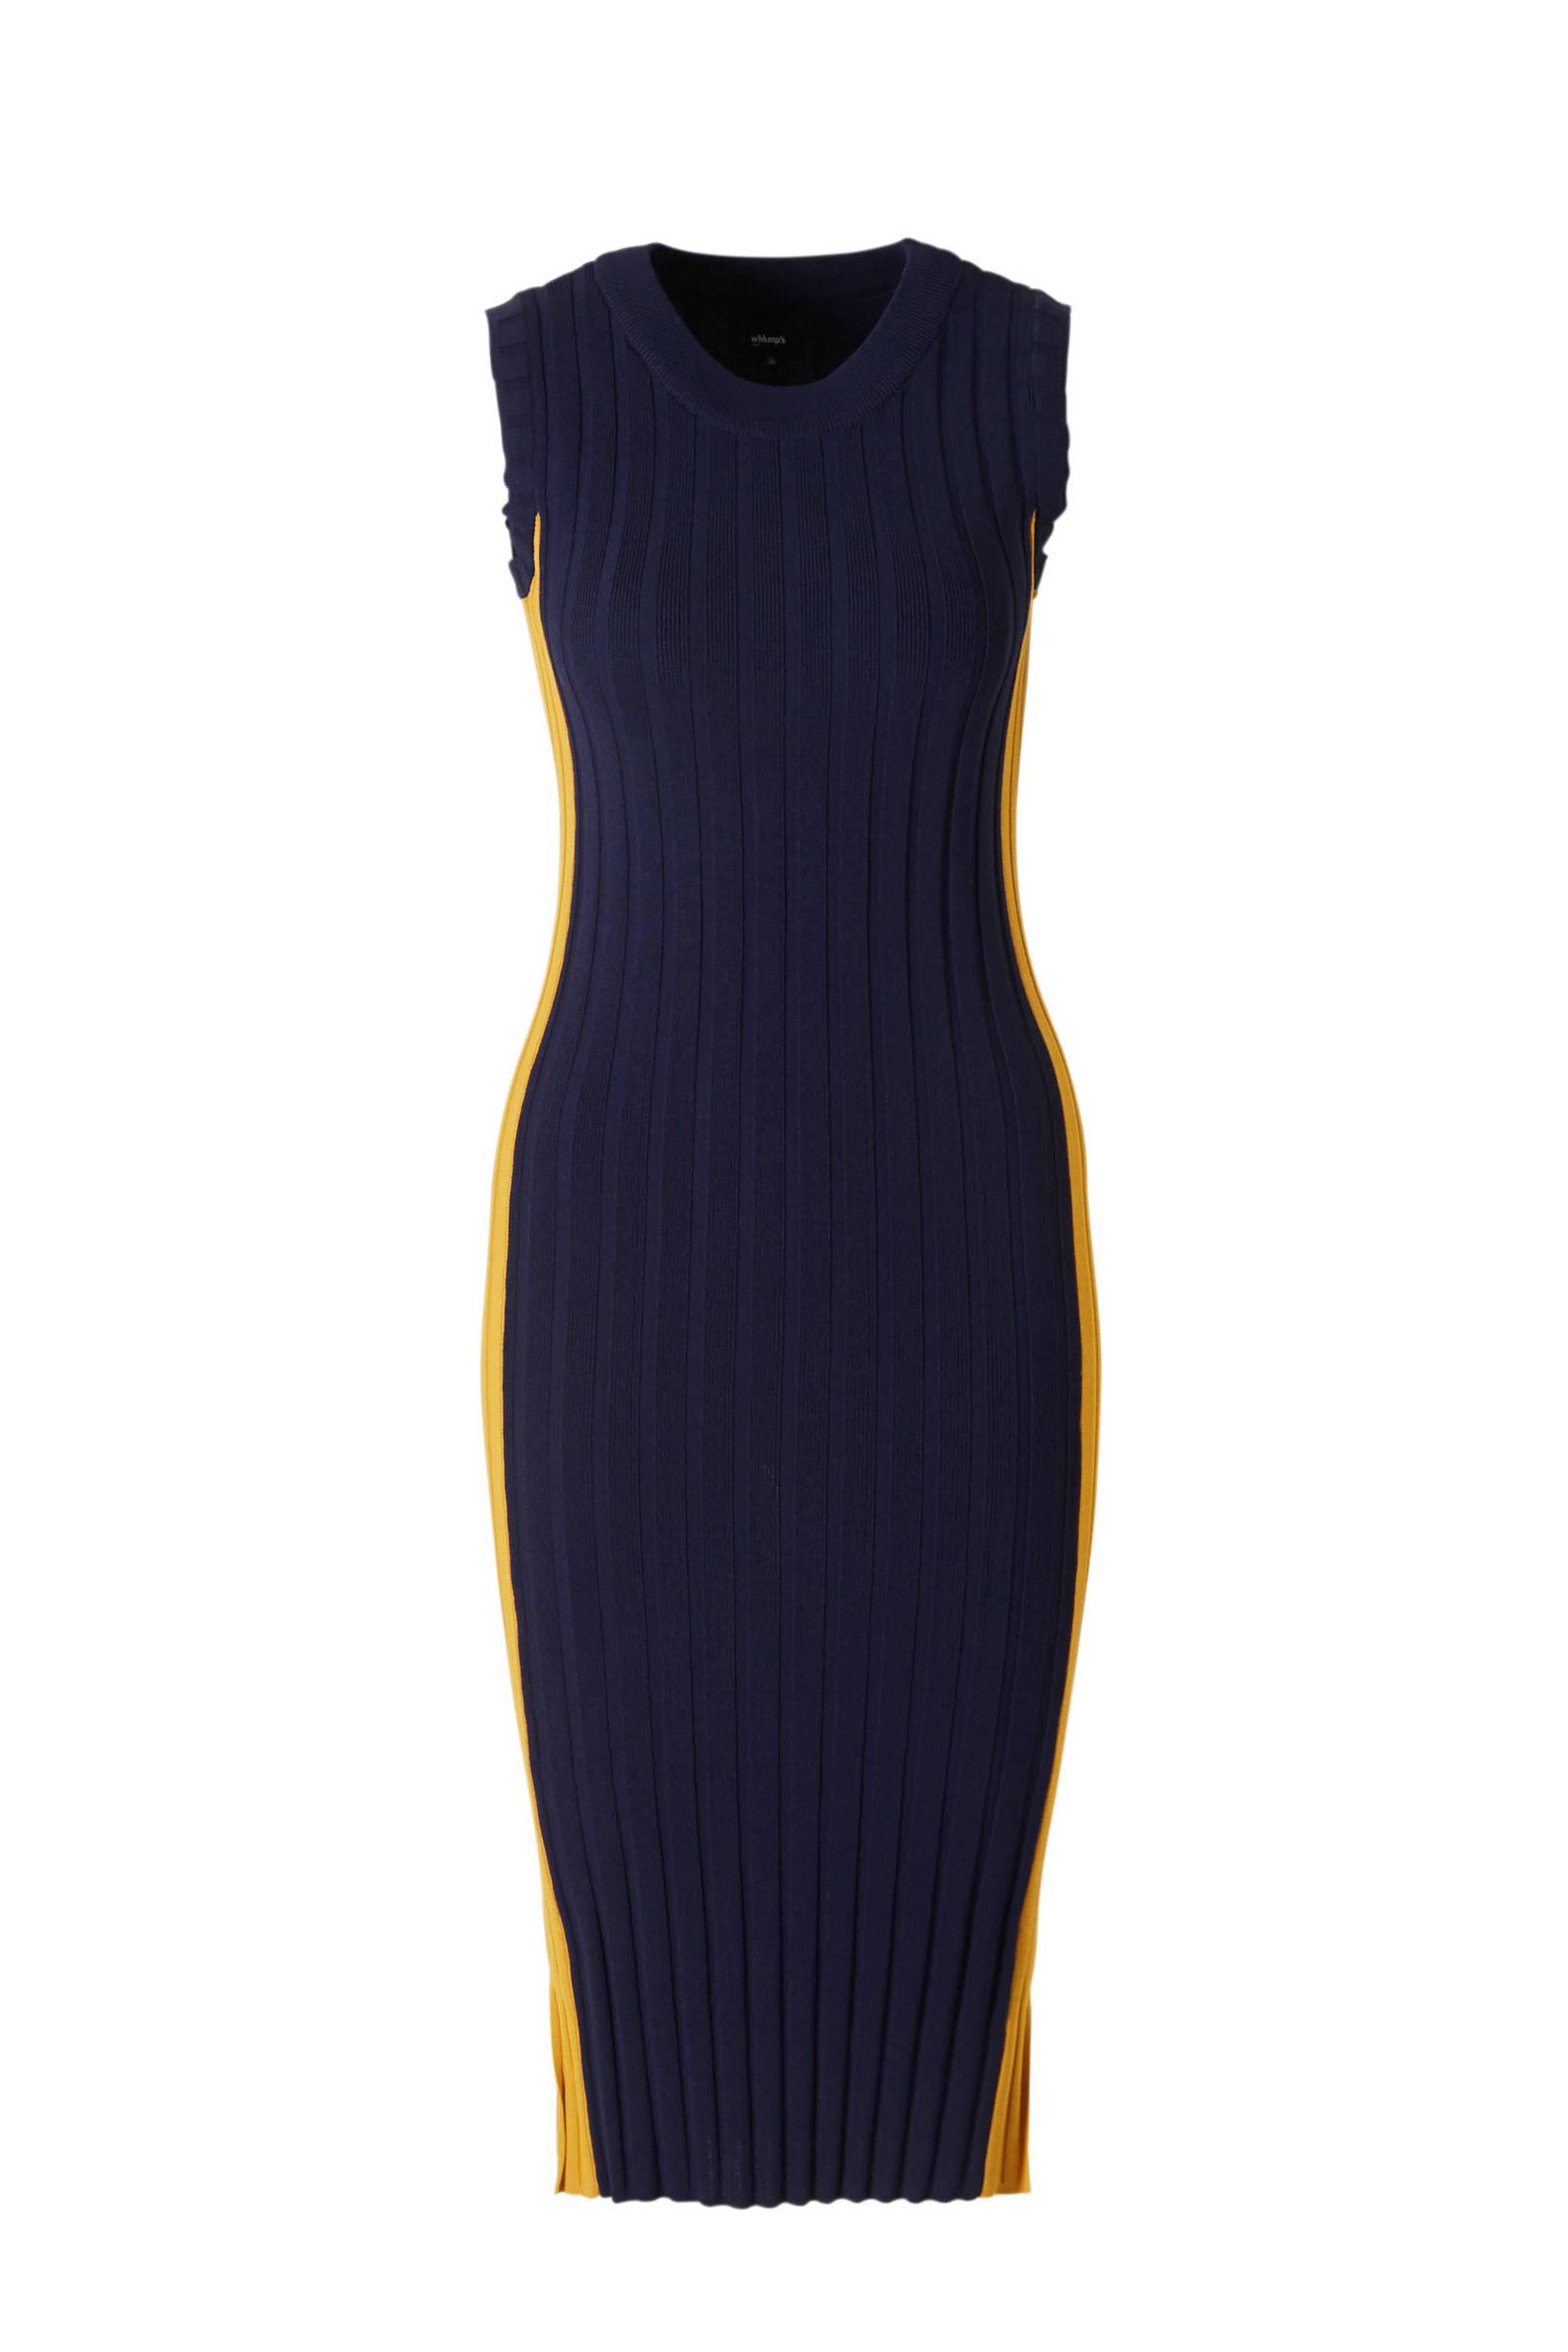 7e6cc32942832e whkmp s own fijnbrei jurk in rib